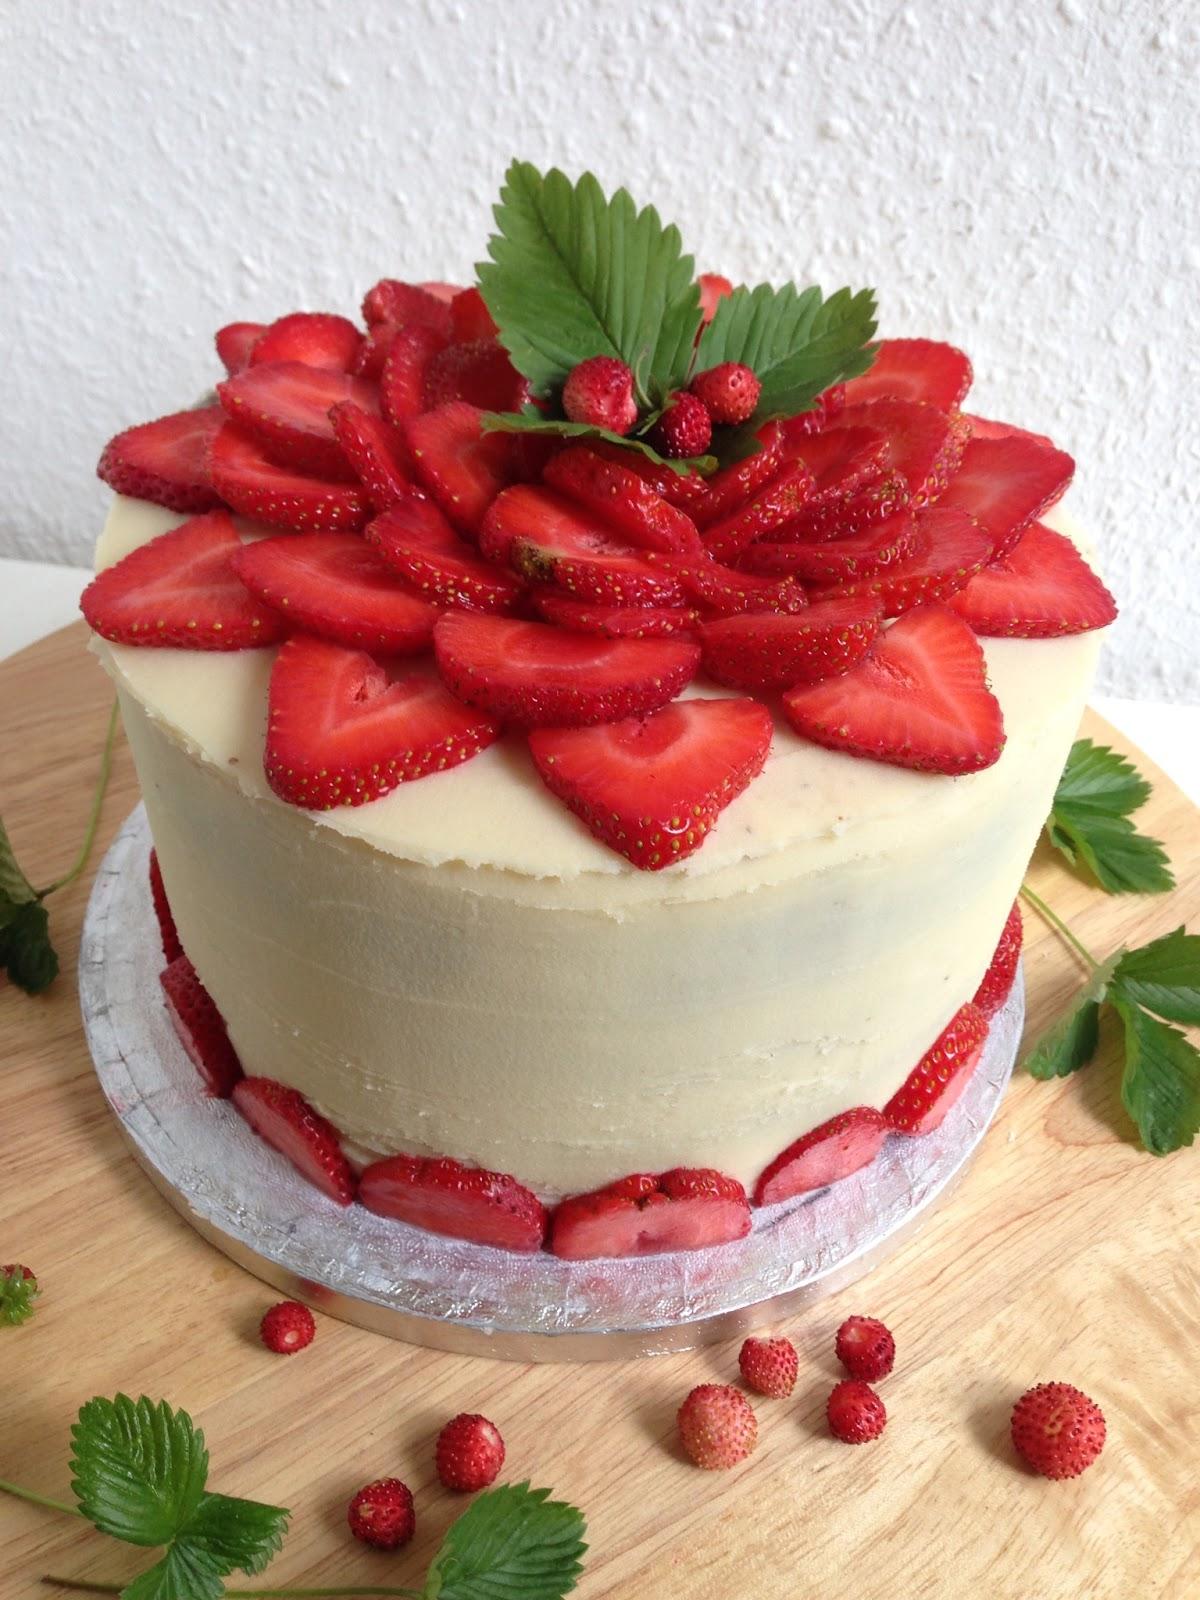 Schoko sahne torte zweistockig